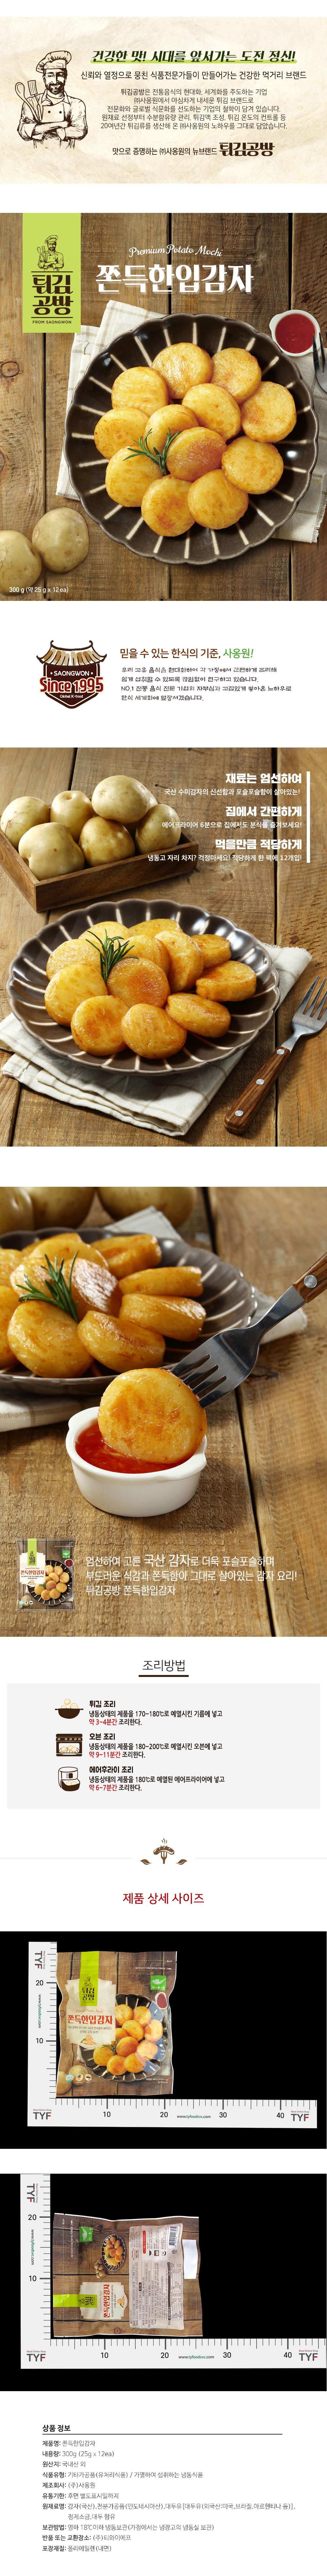 saongwon_potato.jpg